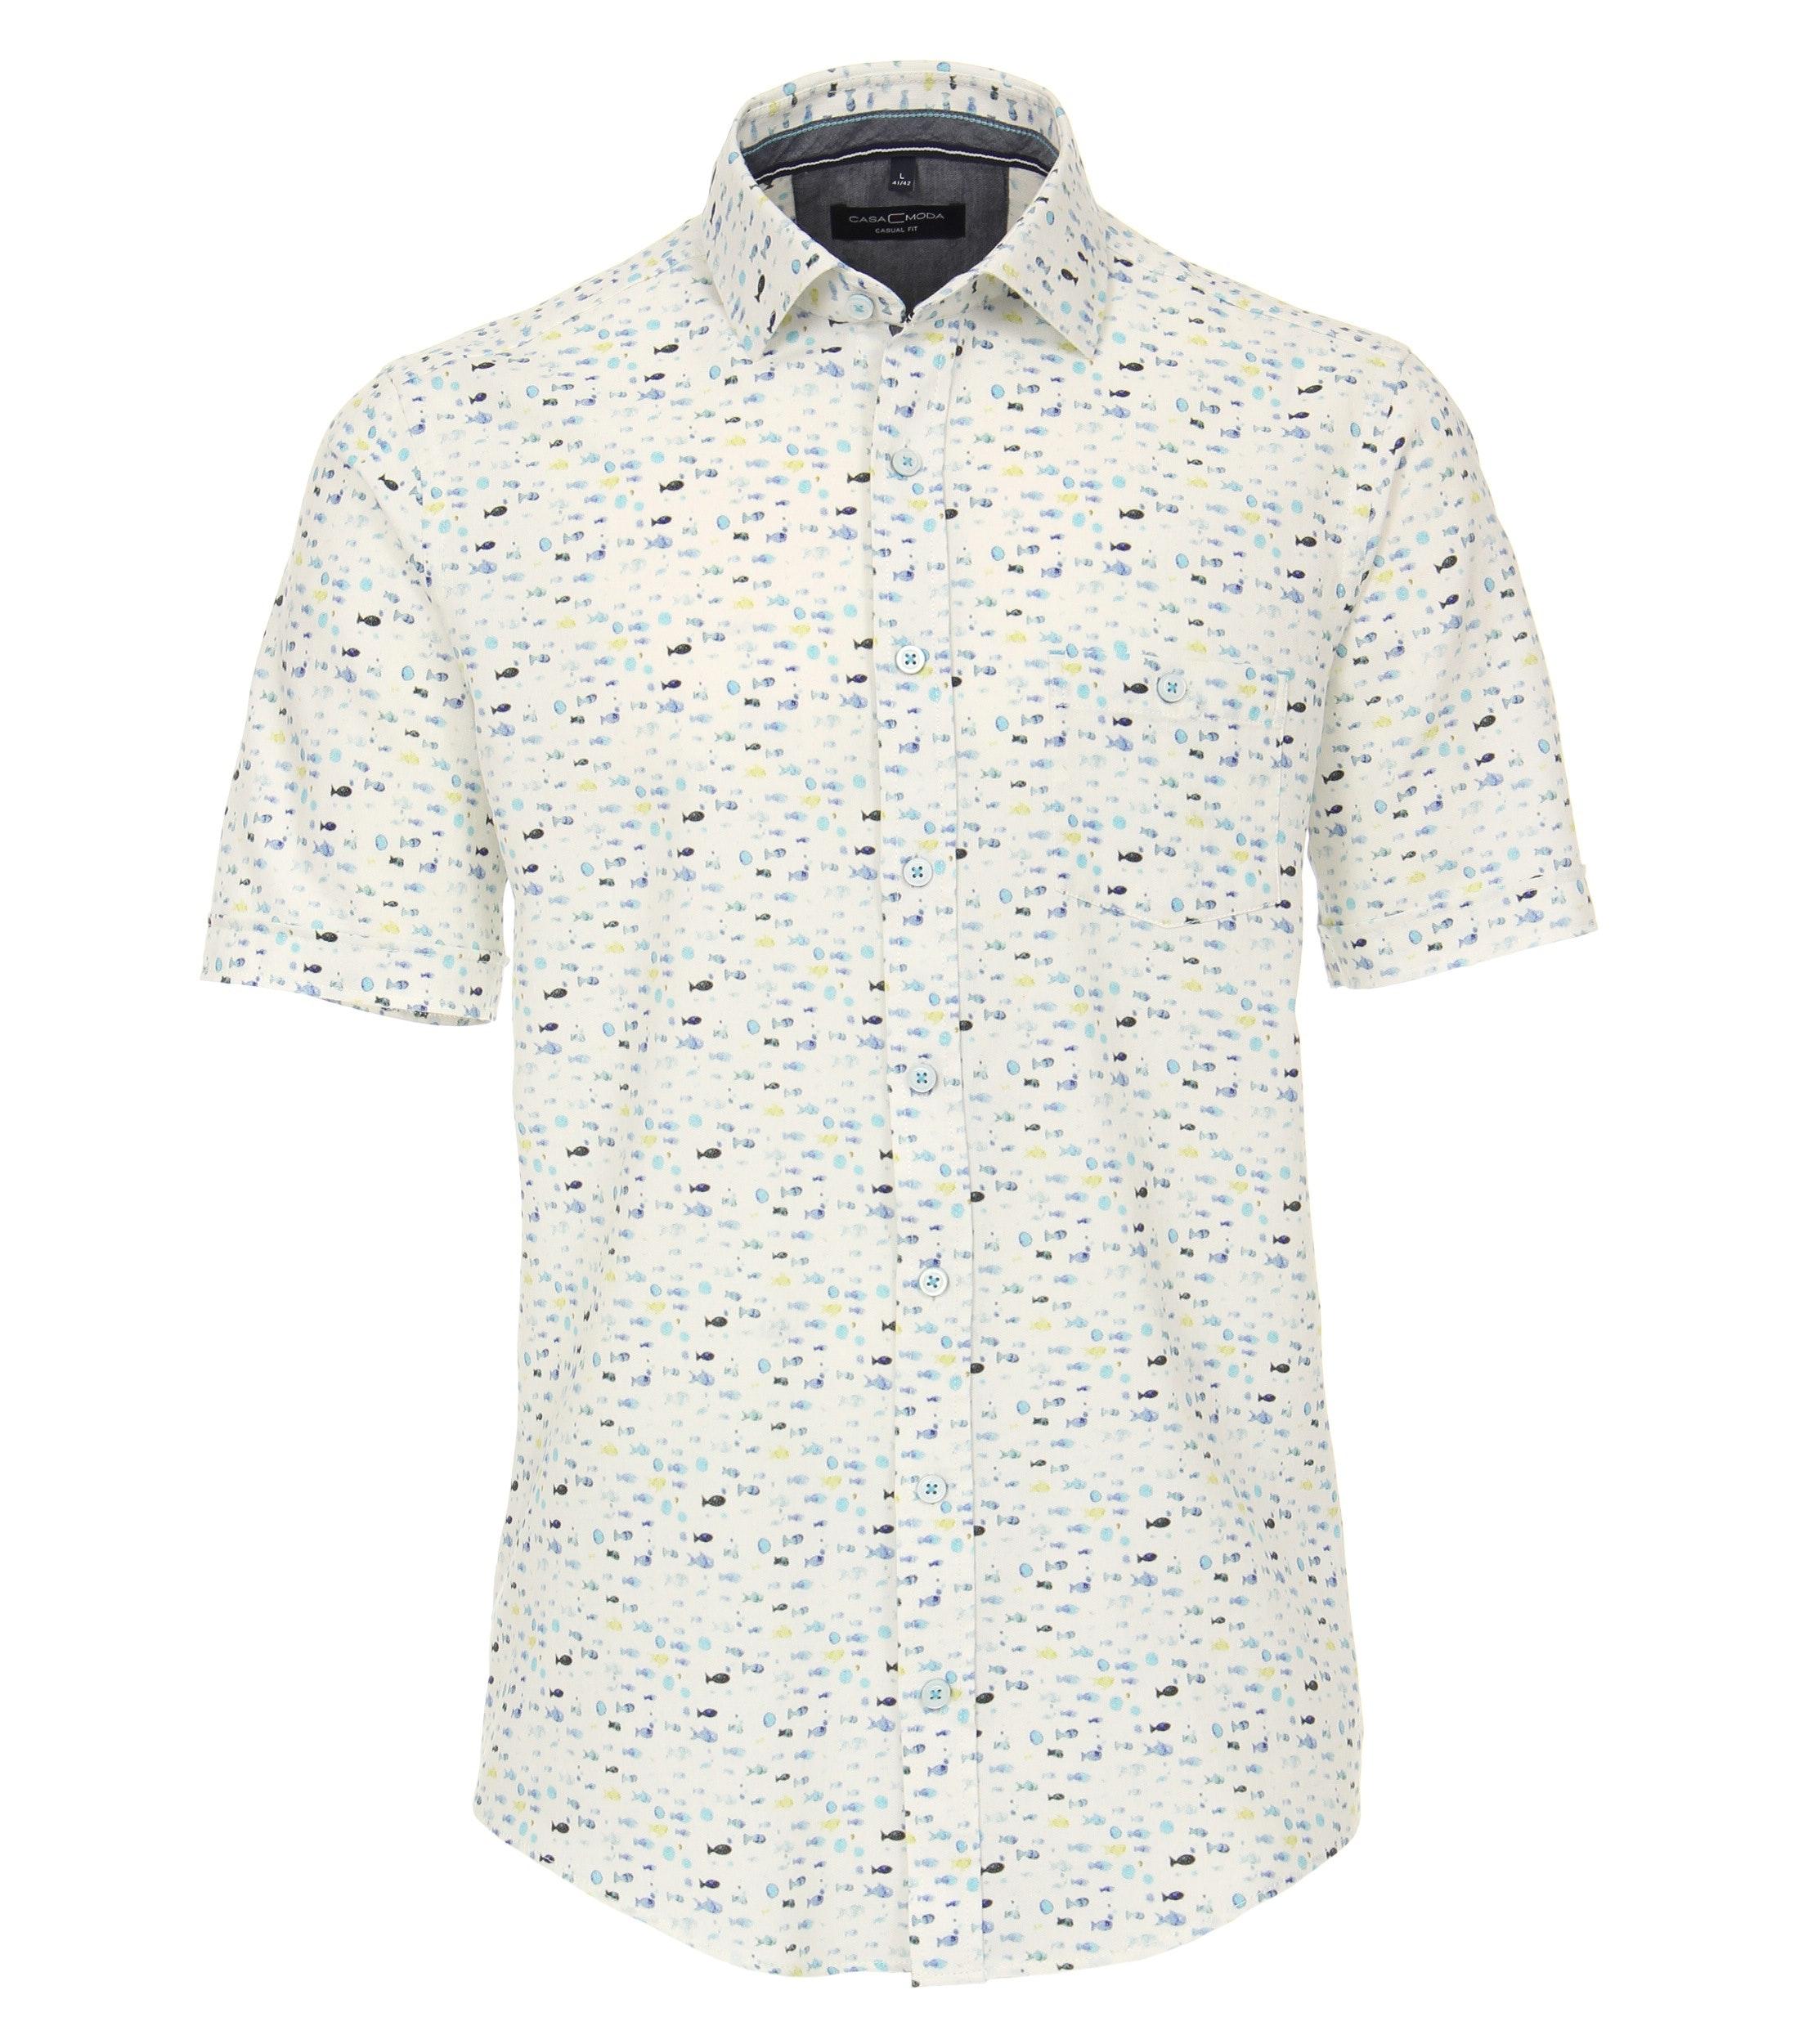 CasaModa halbarm Hemd aus Baumwolle gemustert blau